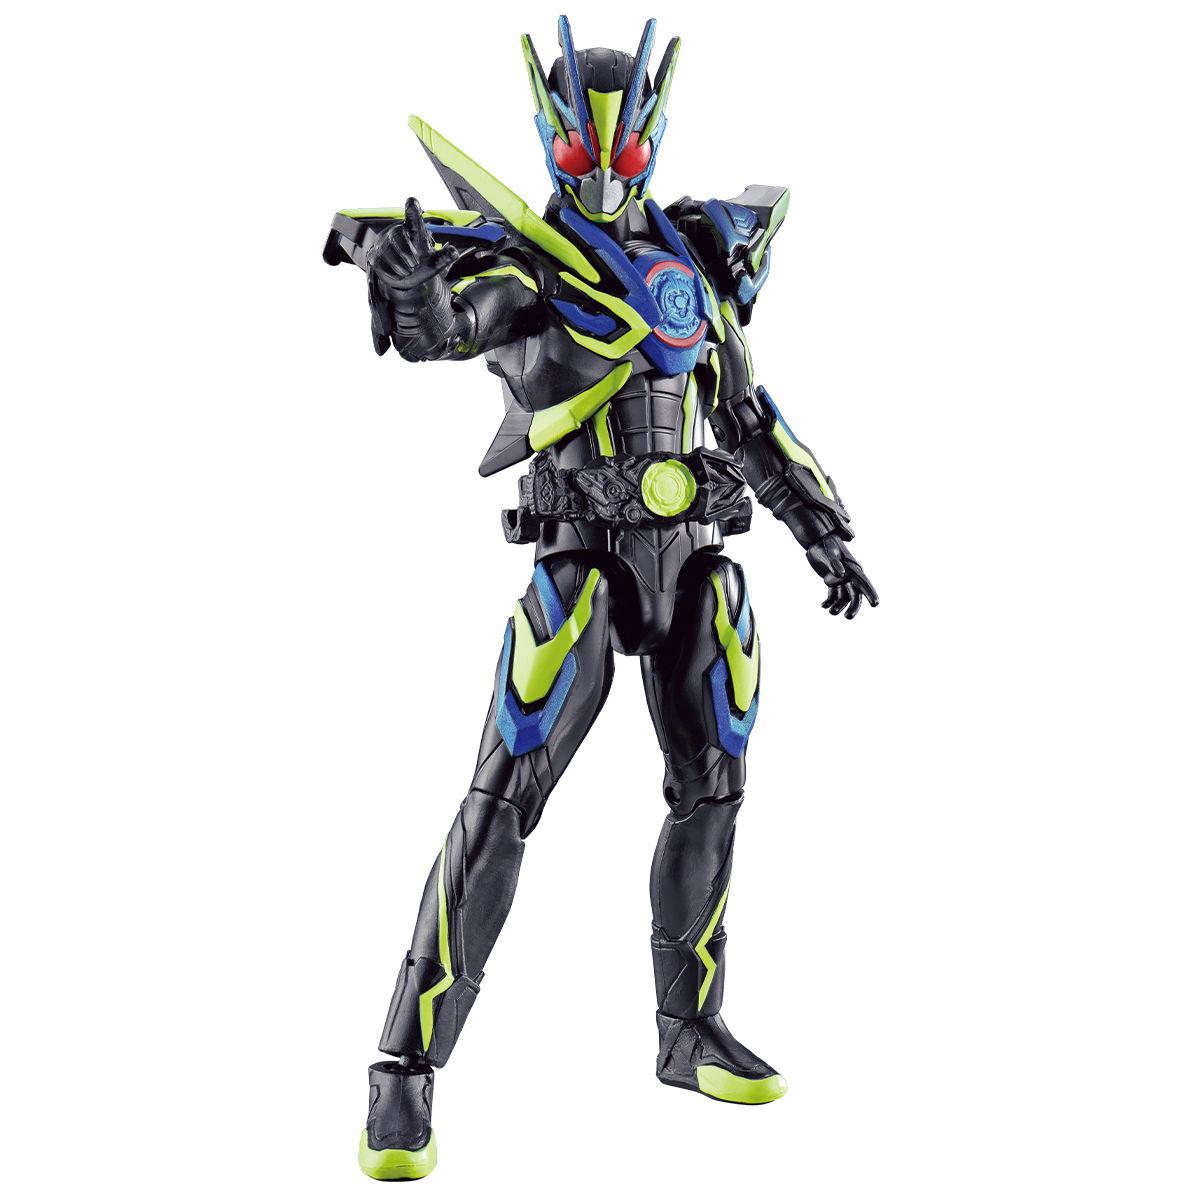 RKF『仮面ライダーゼロワン シャイニングアサルトホッパー』可動フィギュア-001